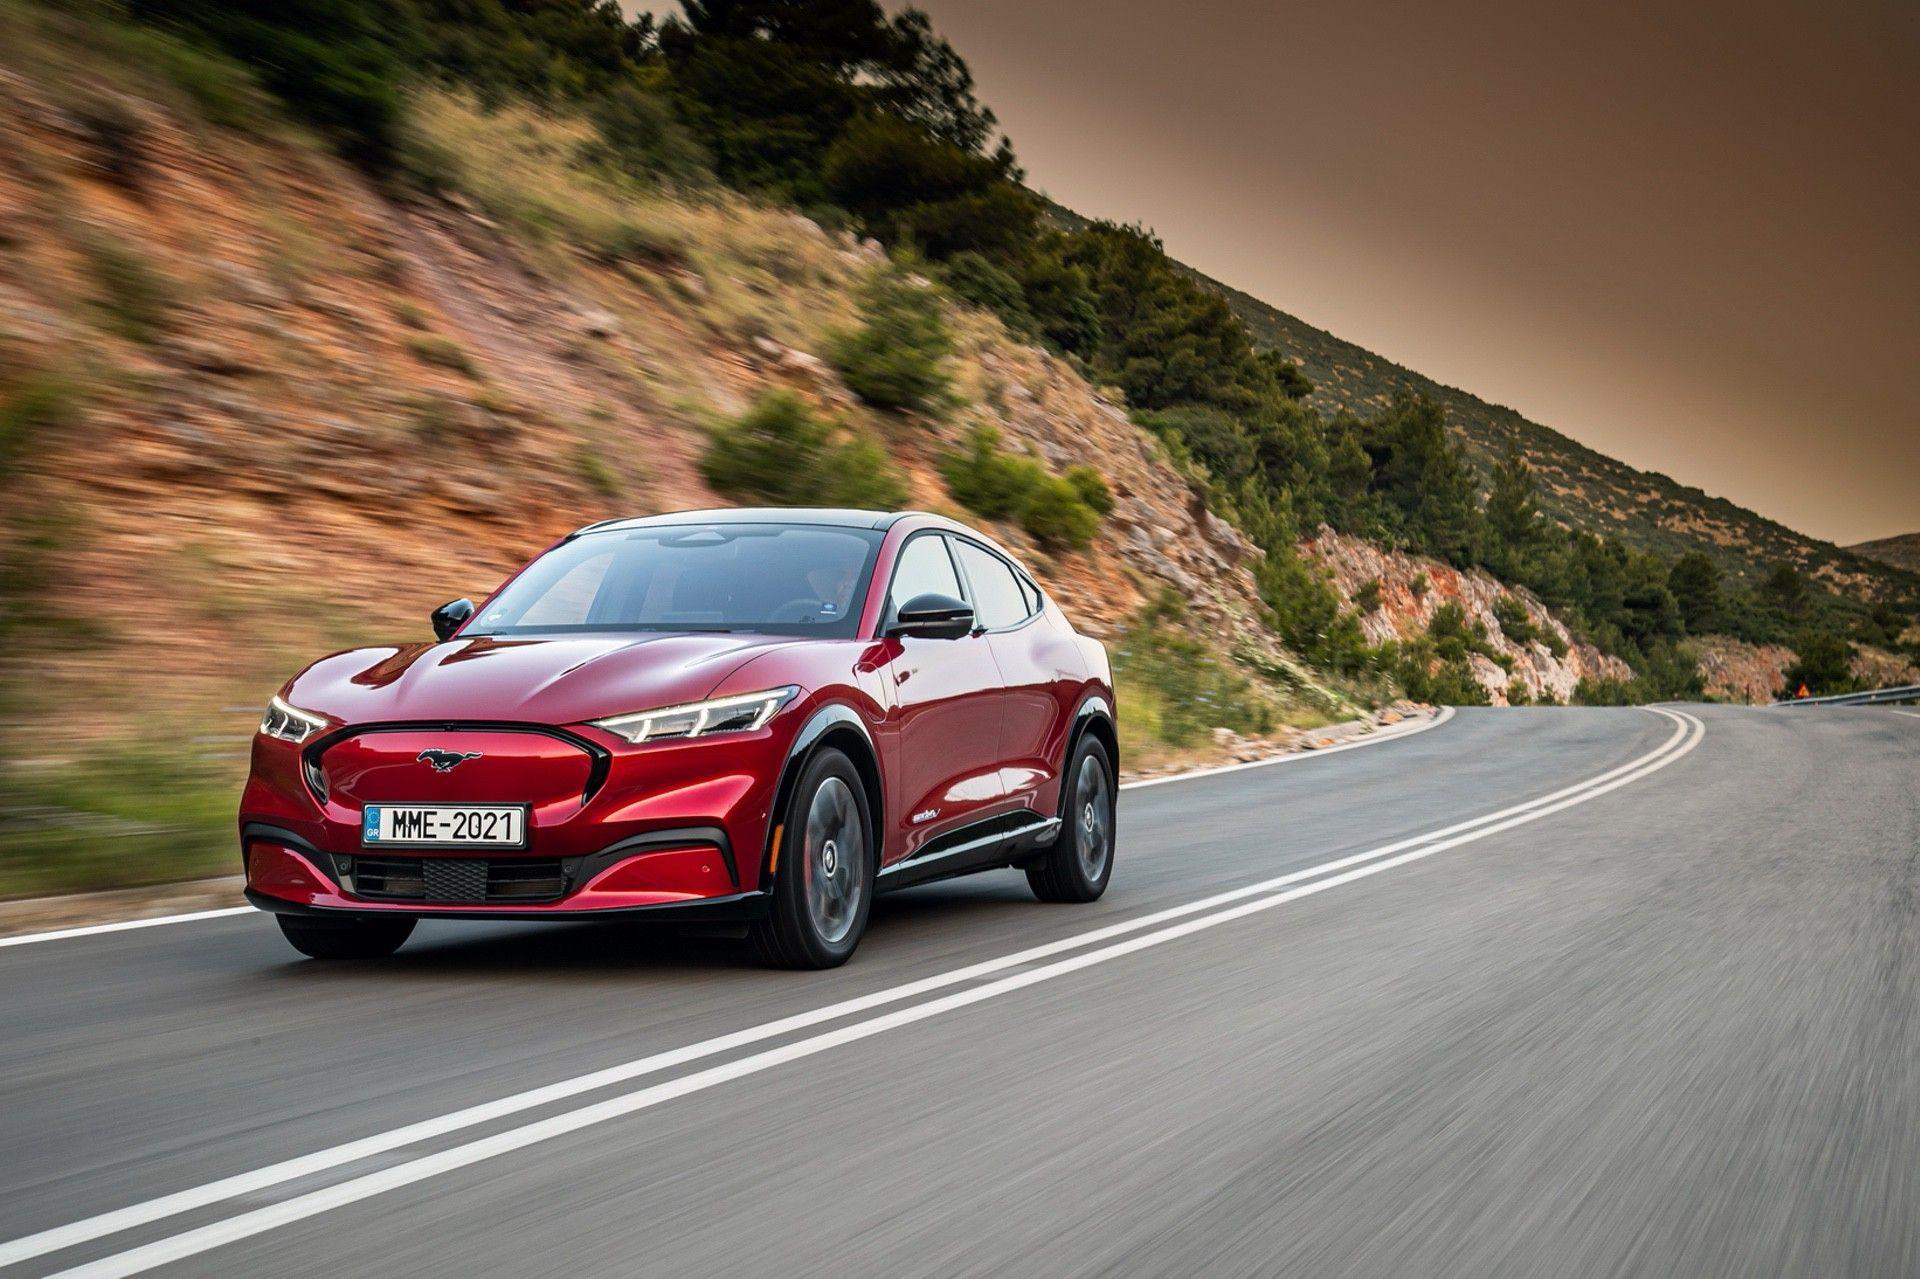 Ford_Mustang_Mach-E_greek_presskit-0105